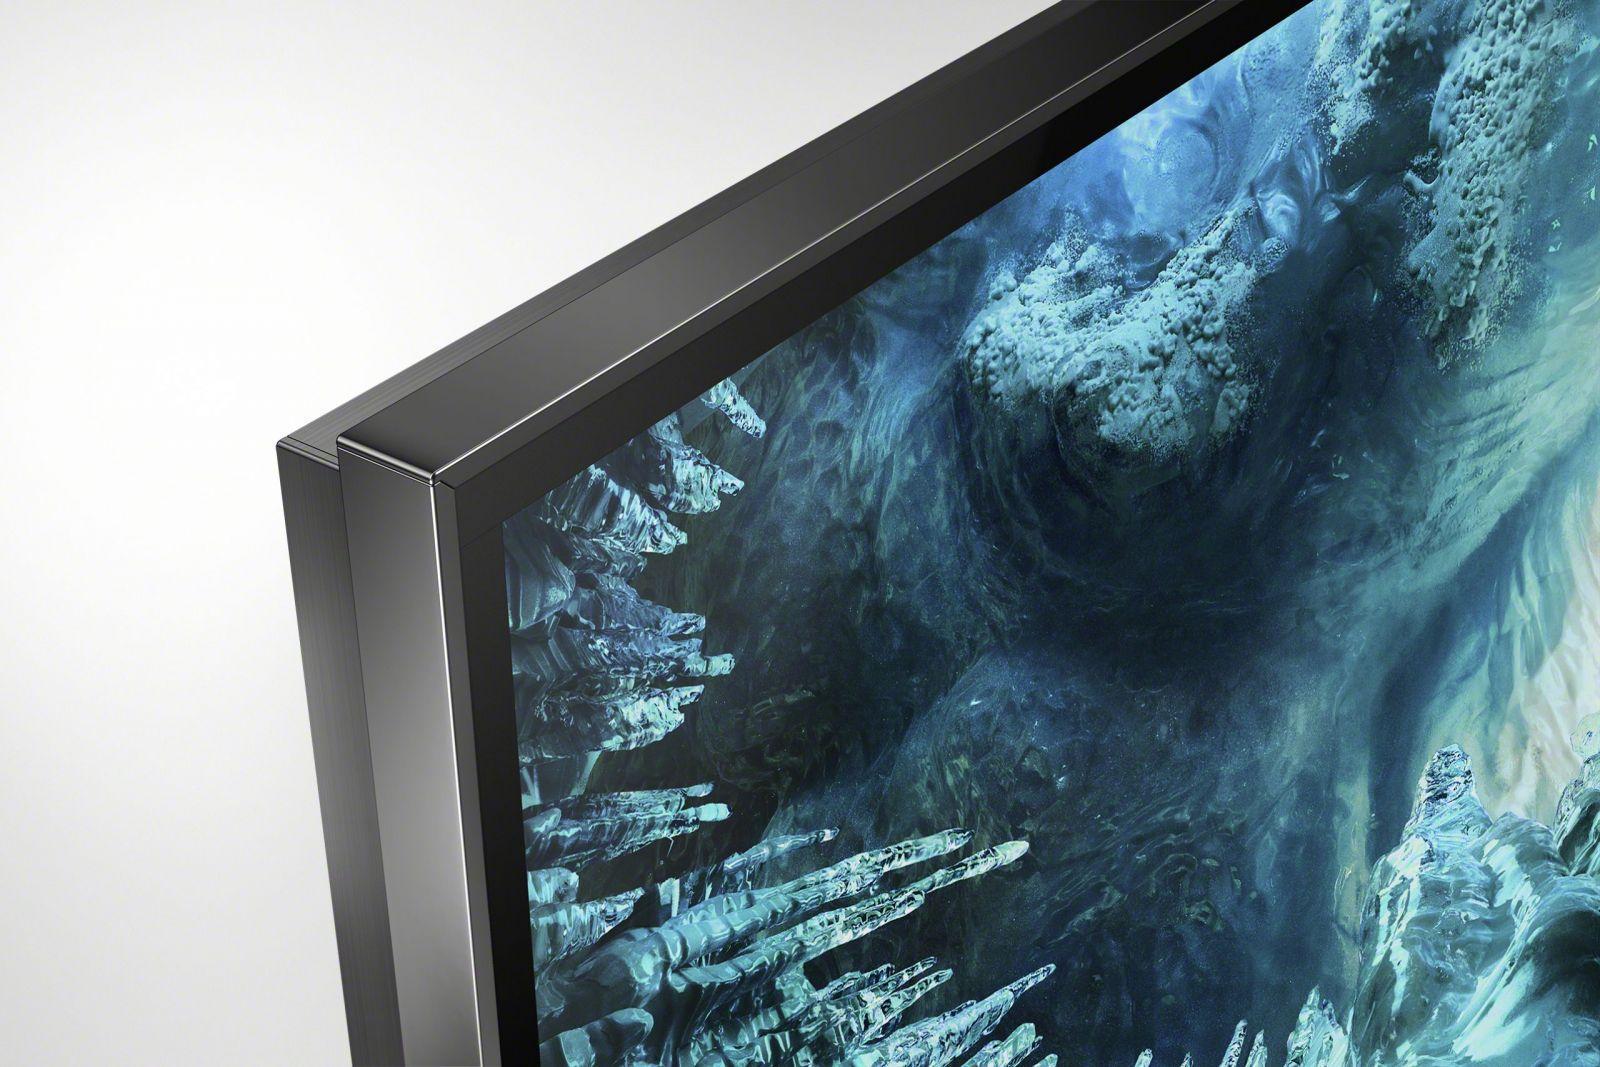 8K-телевизор Sony BRAVIA серии ZH8 с полной прямой подсветкой уже в продаже (85 z8h zh8 dark sil polished dark sil edge bz scaled)